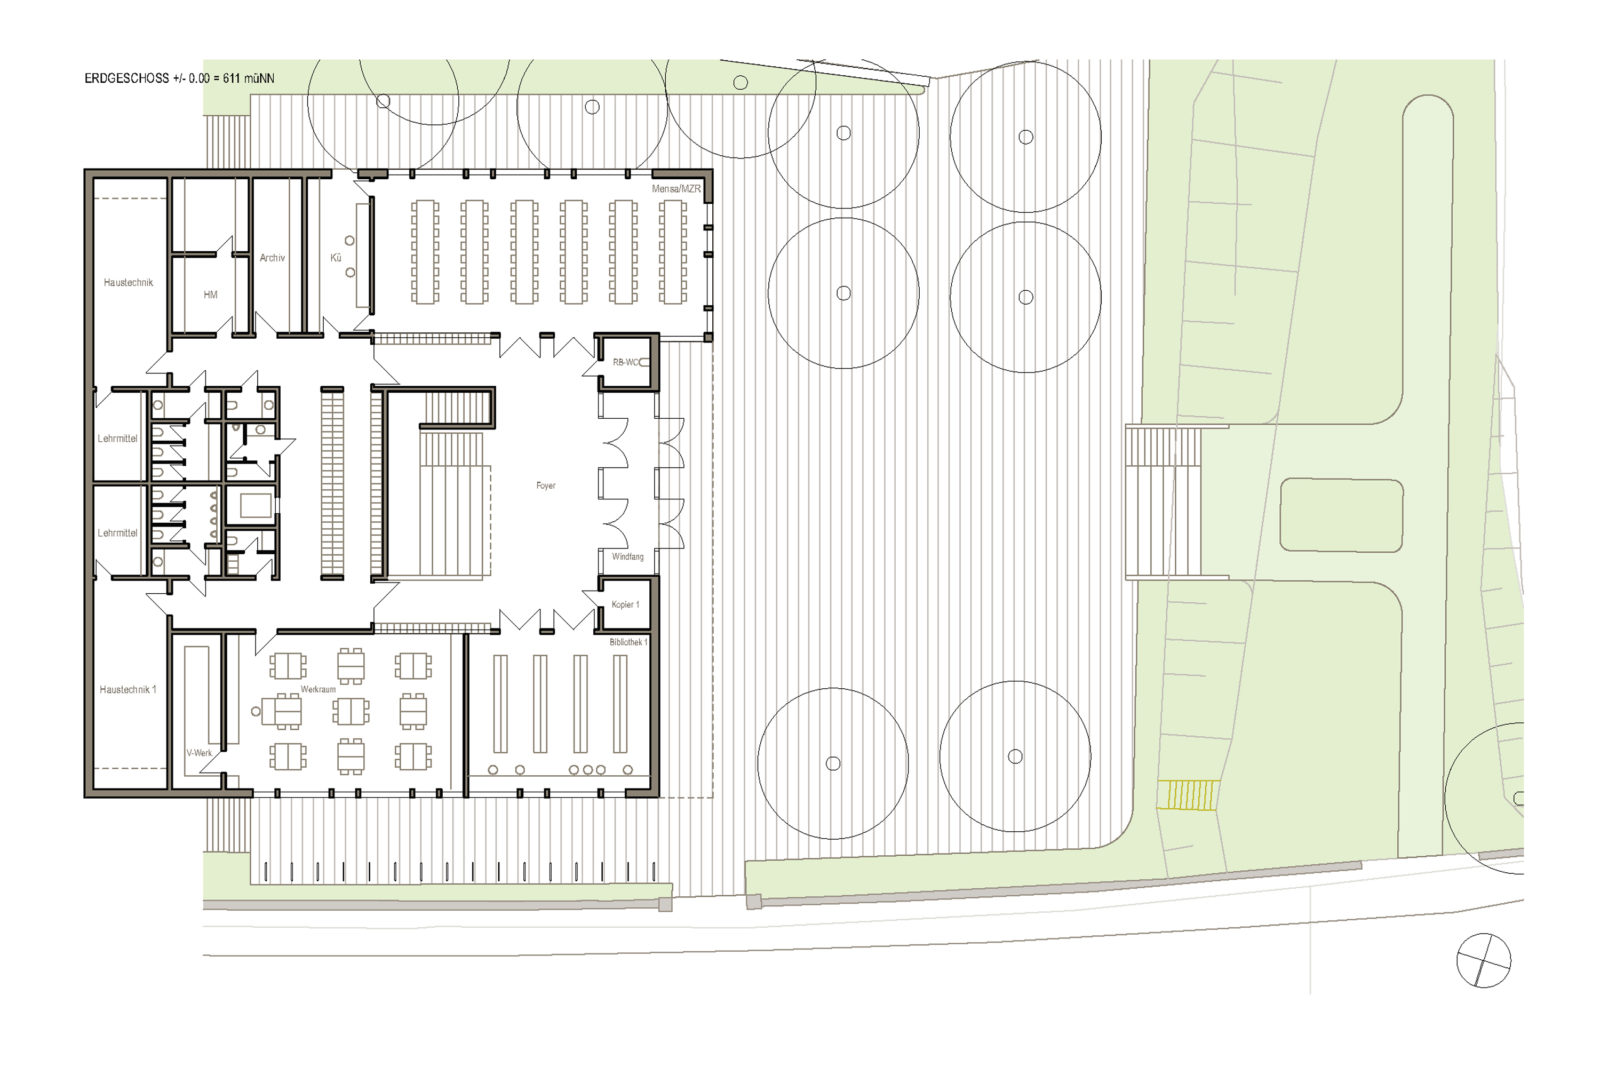 Oberschule Geyer Erdgeschoss